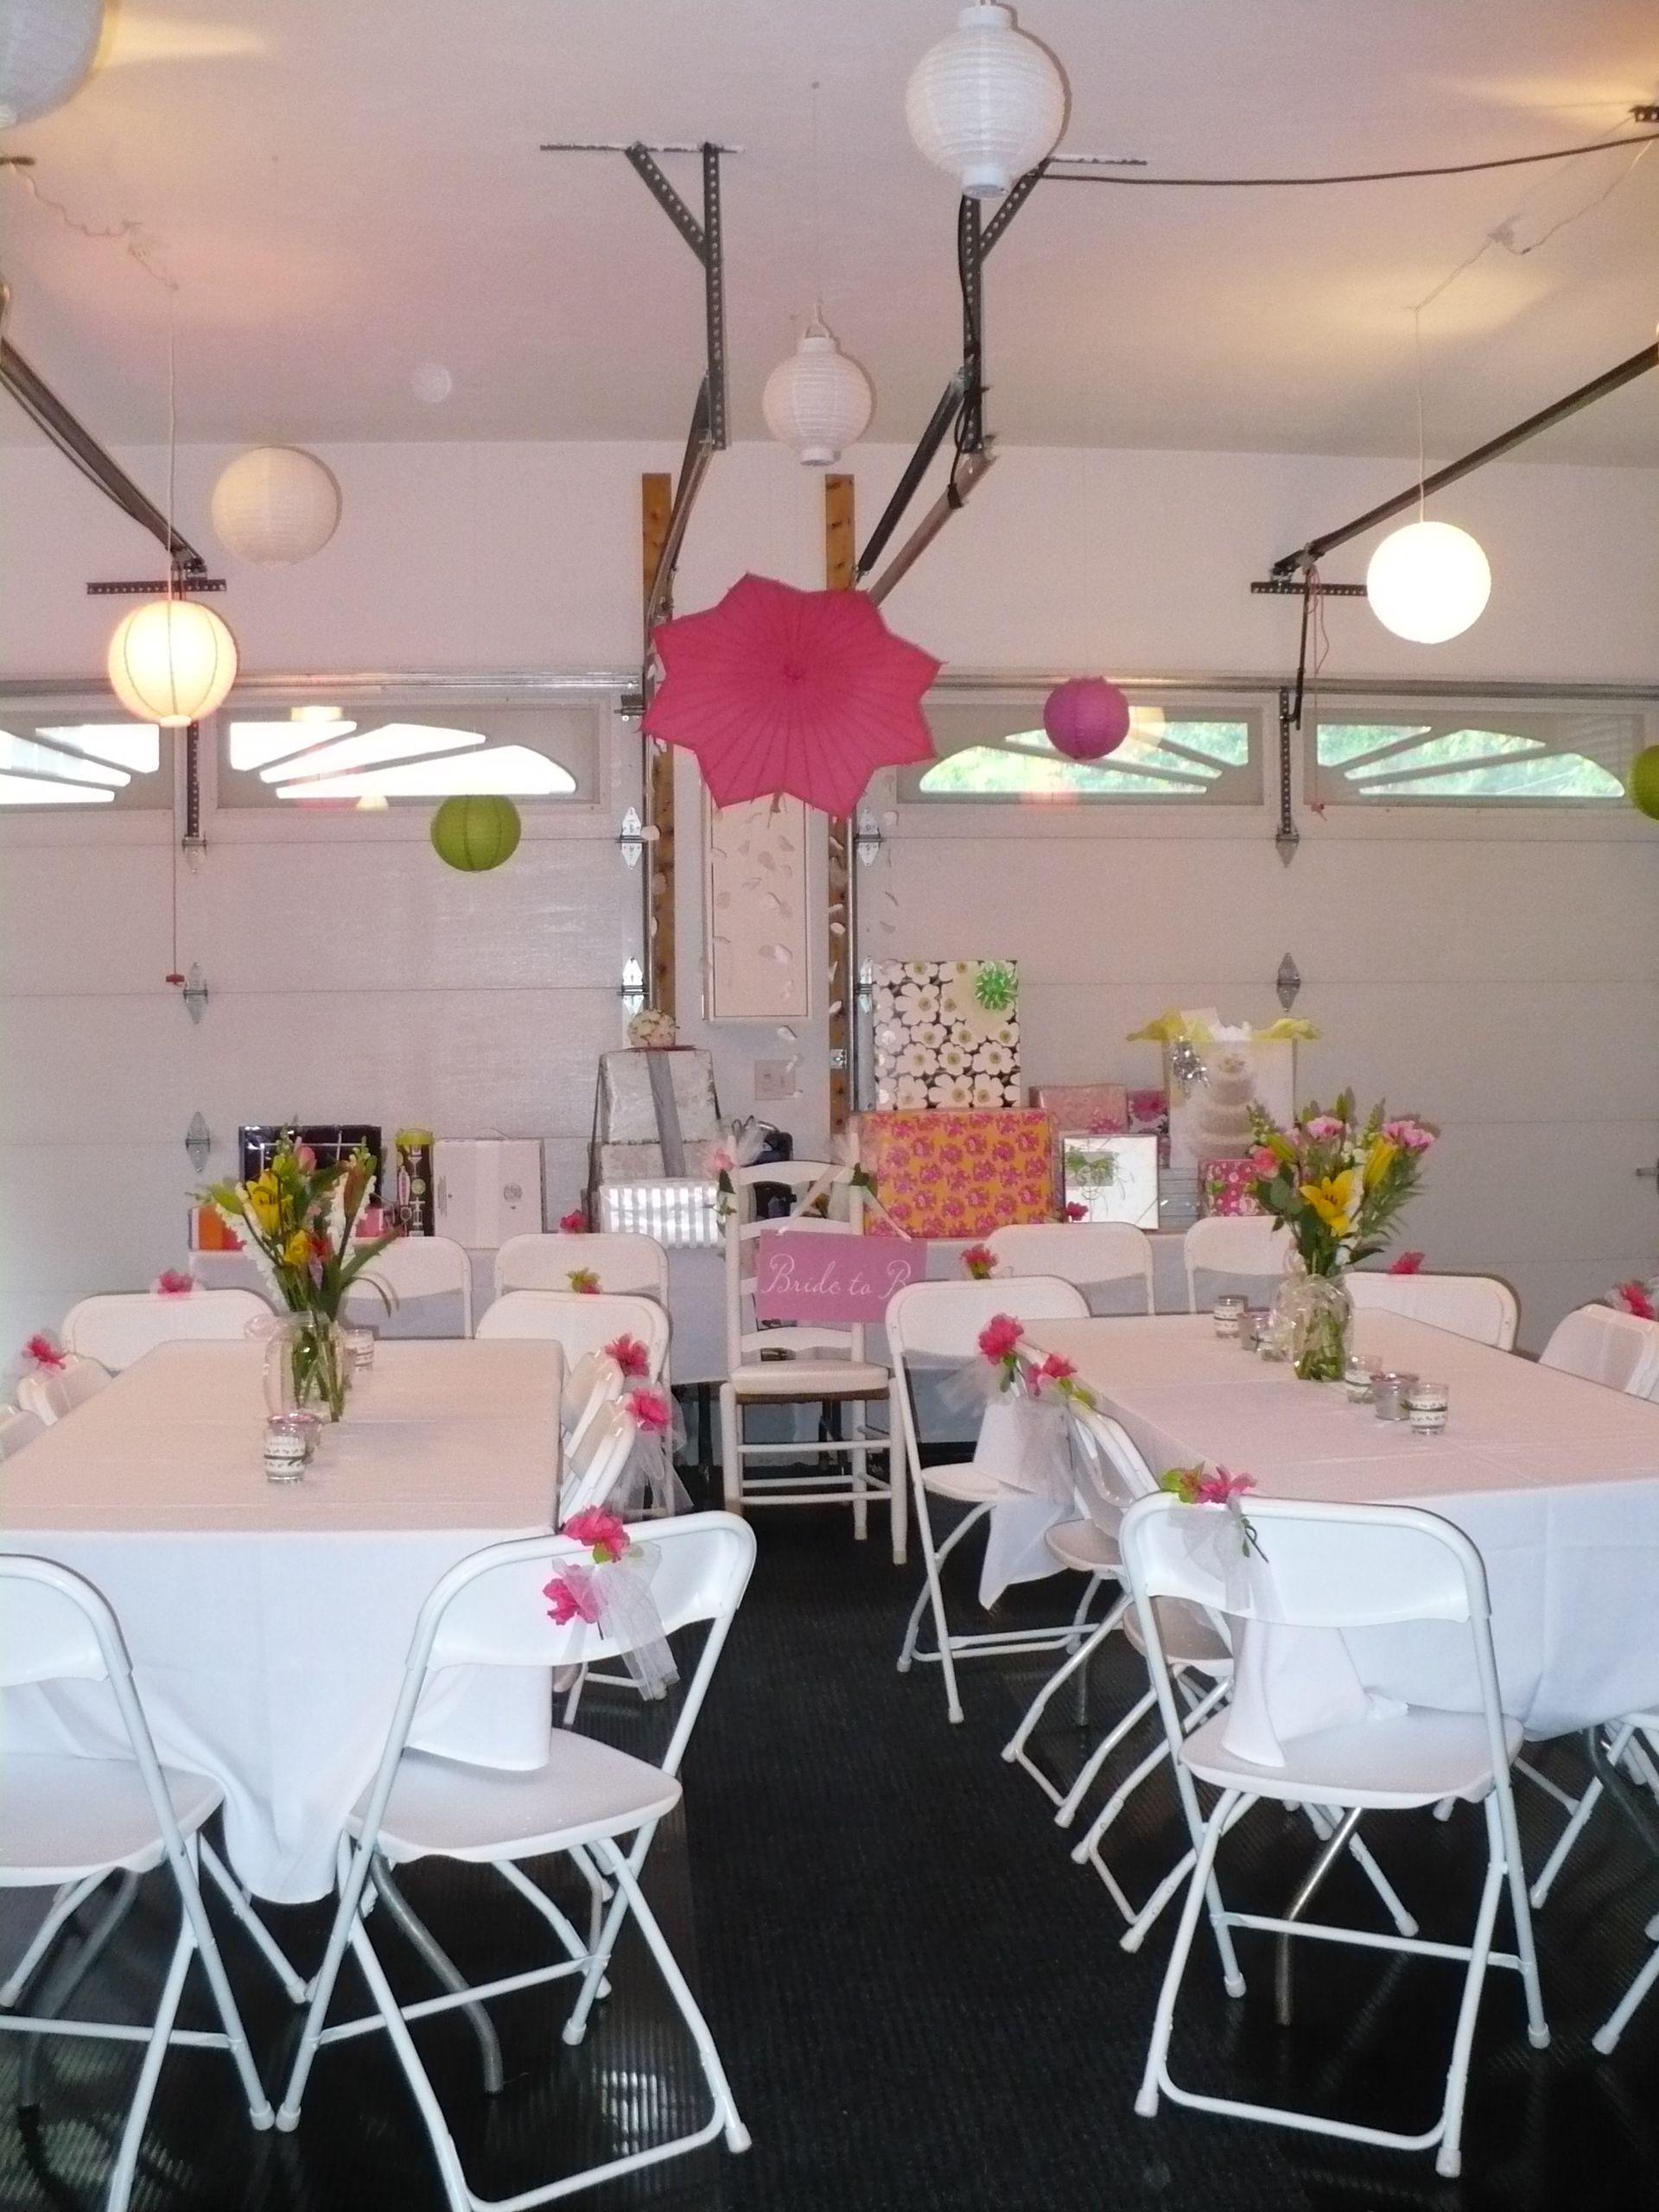 Garage Transformation For A Bridal Shower Garage Party Decorations Garage Party Bridal Shower